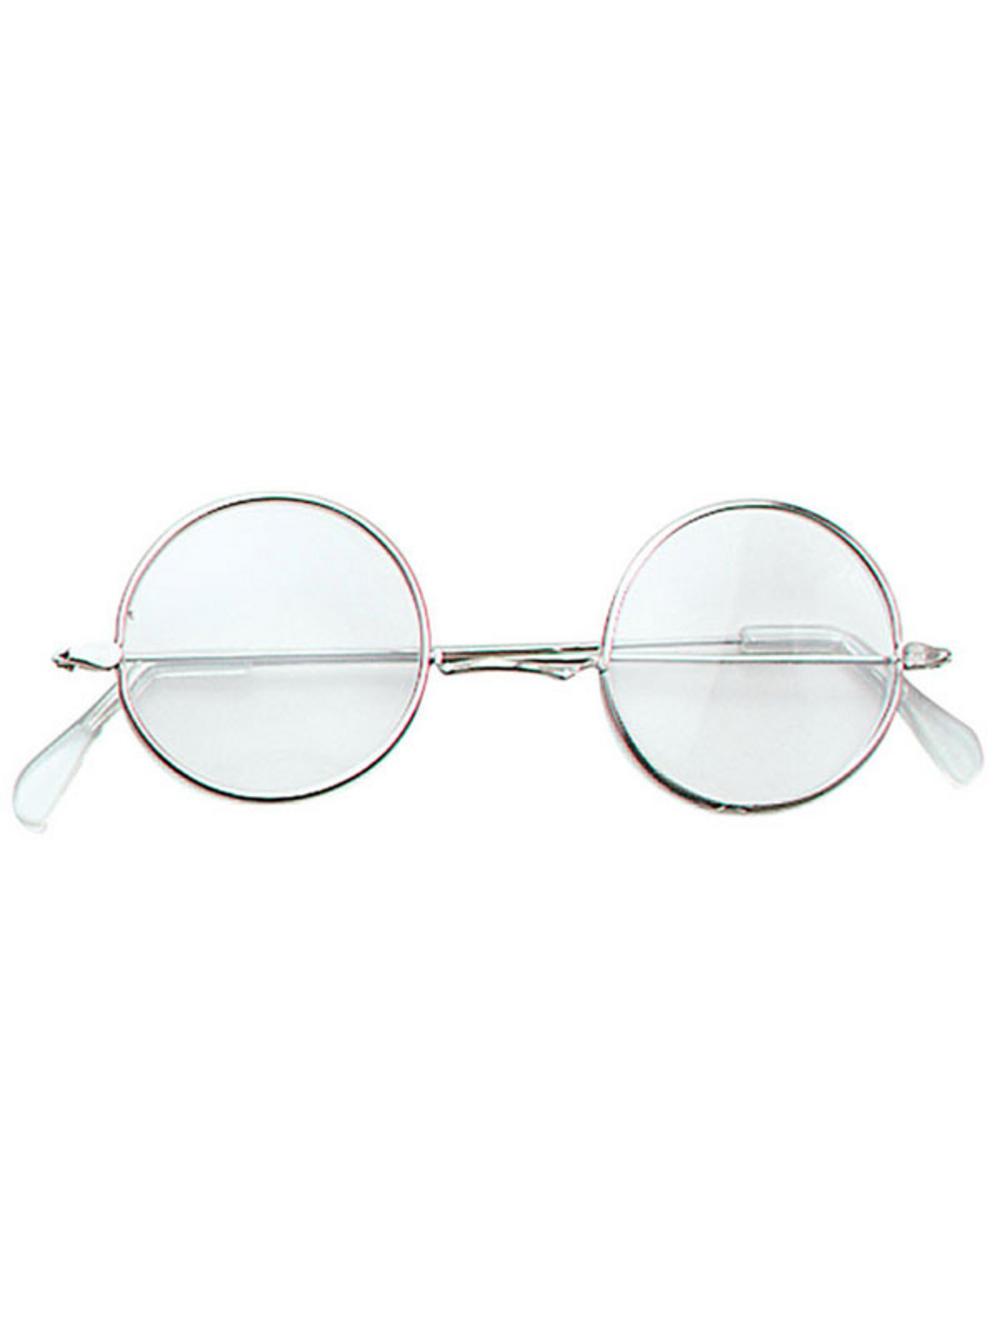 where can i buy lennon glasses in melboure cinemas 93 Ray Ban Polarized Aviators hippy hippie 60s 70s john lennon round specs ozzy clear fancy dress glasses new buy online